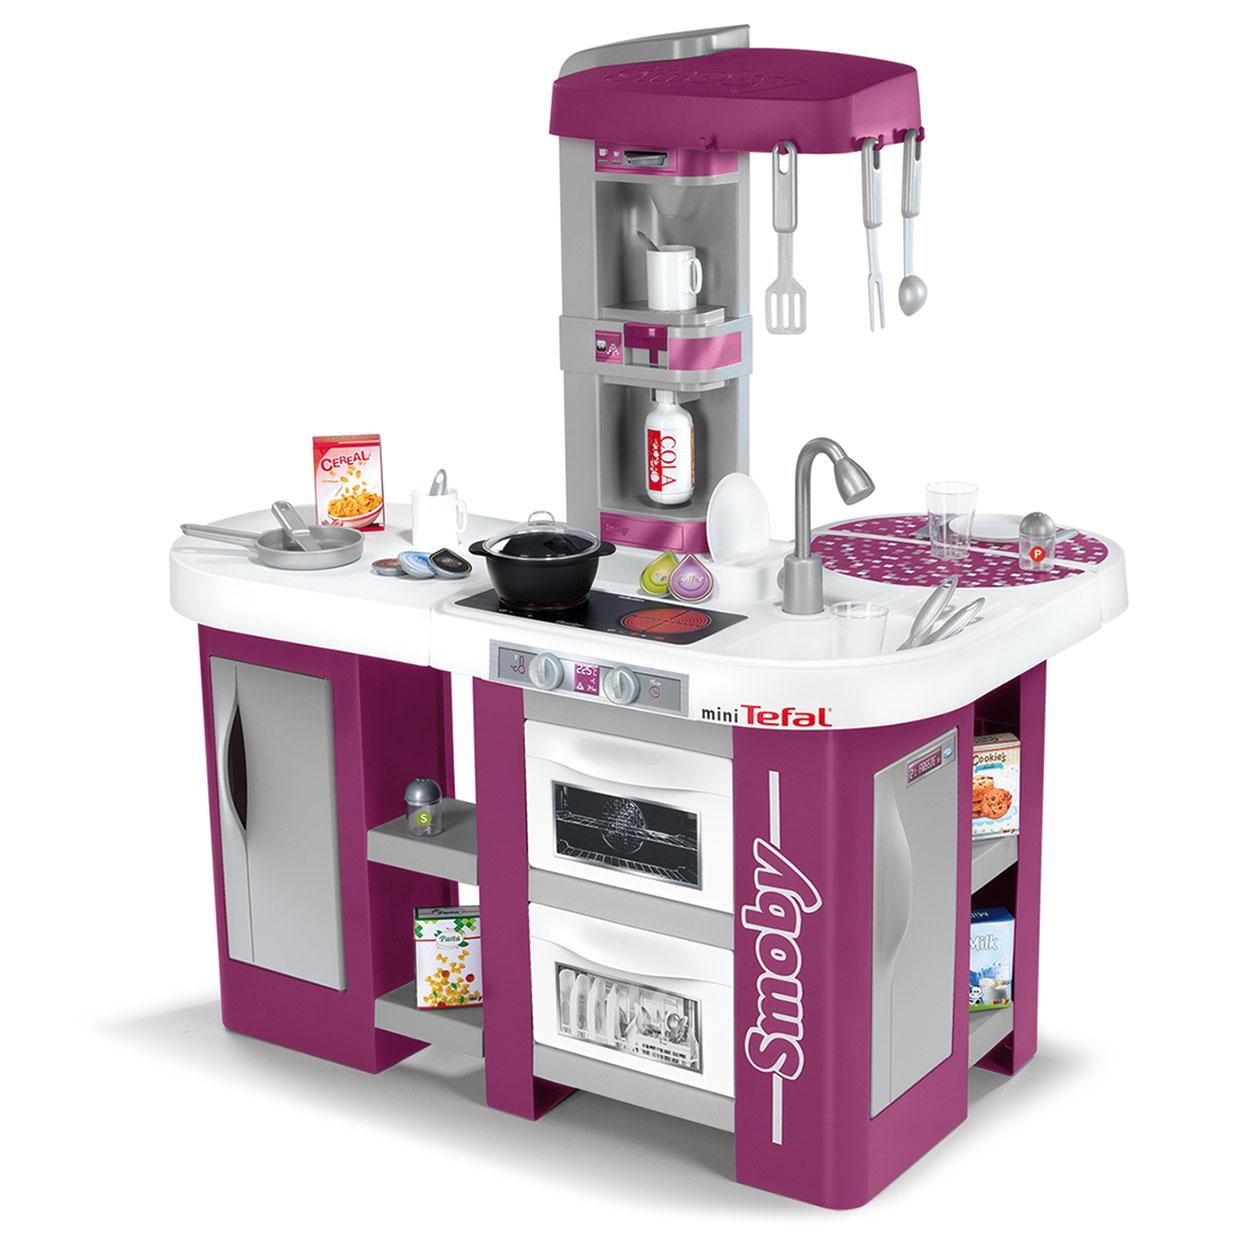 Mini Keuken Speelgoed : Smoby Tefal Keuken Studio XL online kopen Lobbes.nl